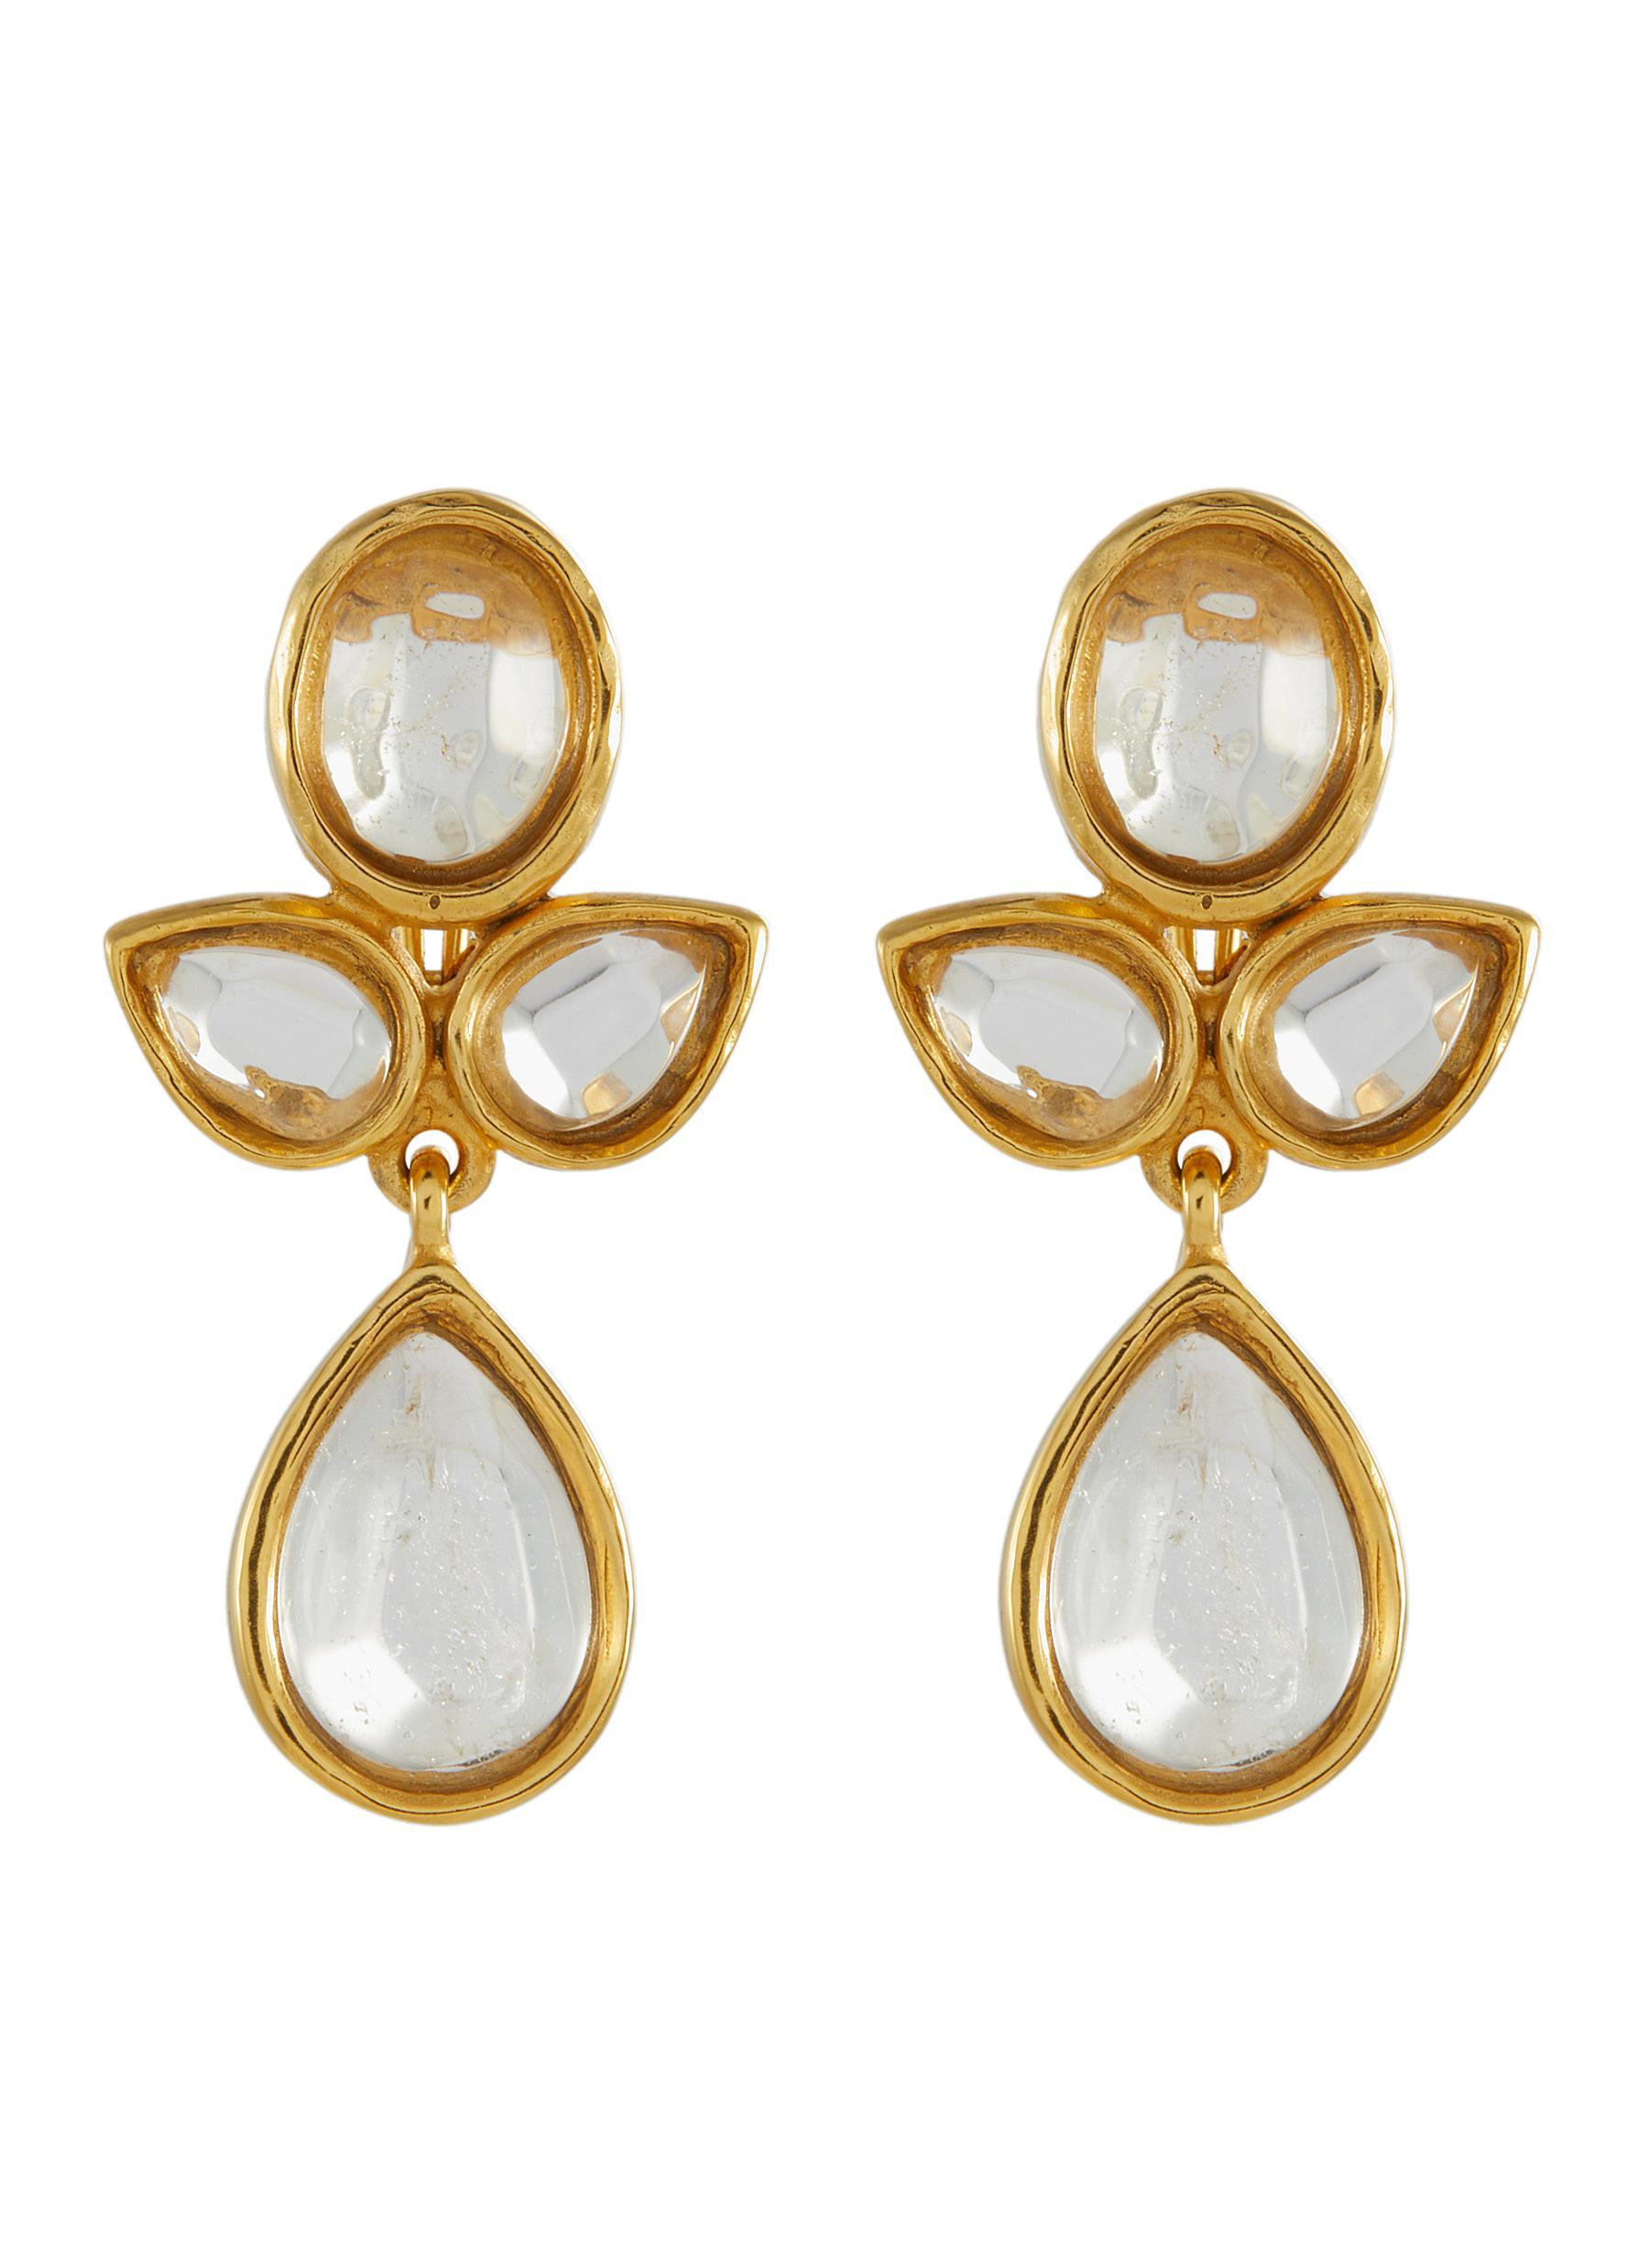 Cachemire' Rhinestone Drop Earrings